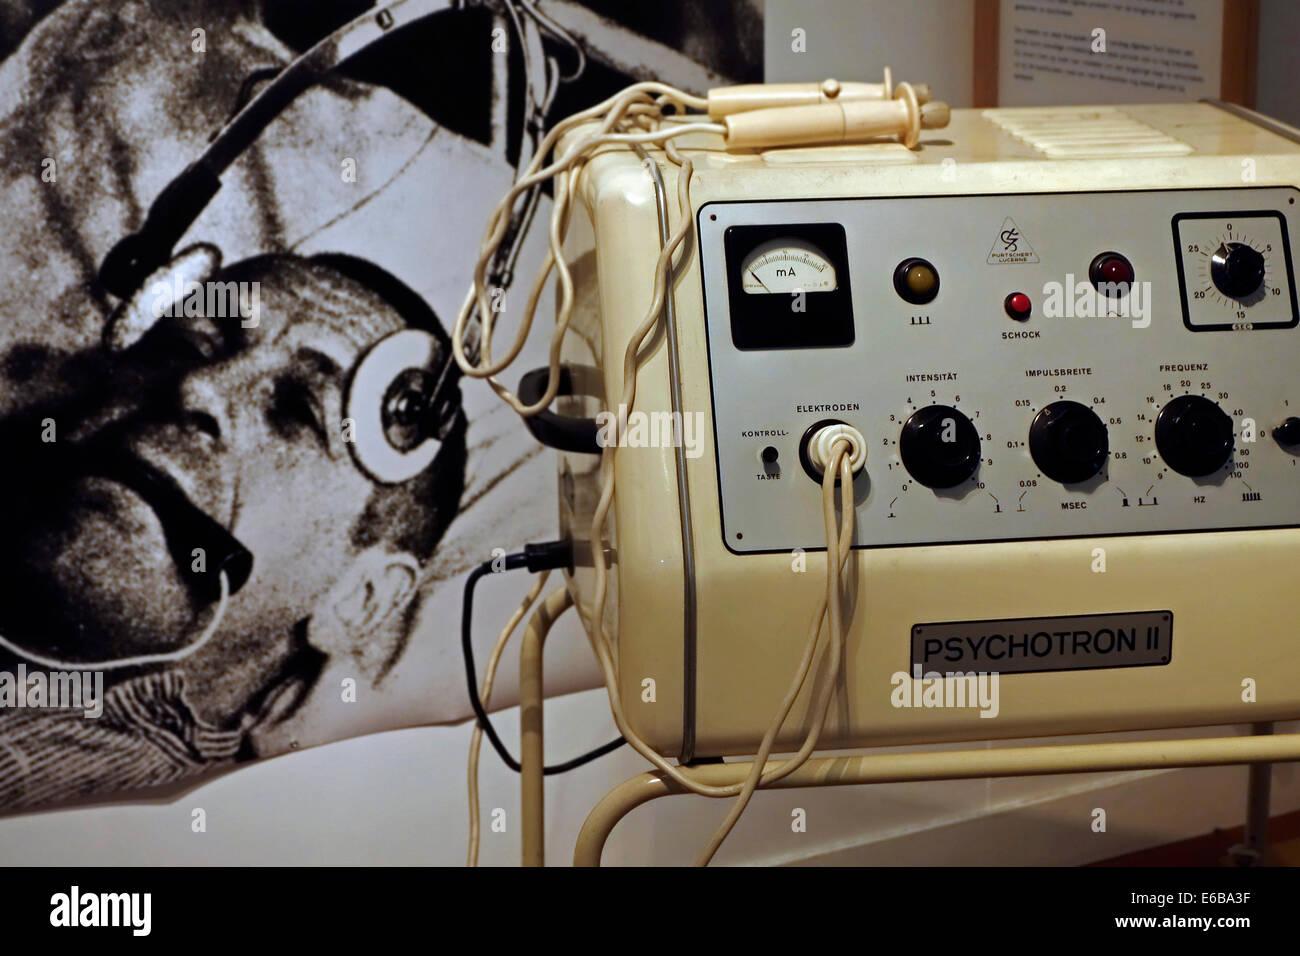 Psychotron II für Elektroschock-Therapie / Elektrokrampftherapie / ECT, Dr. Guislain Museum über die Psychiatrie, Stockbild